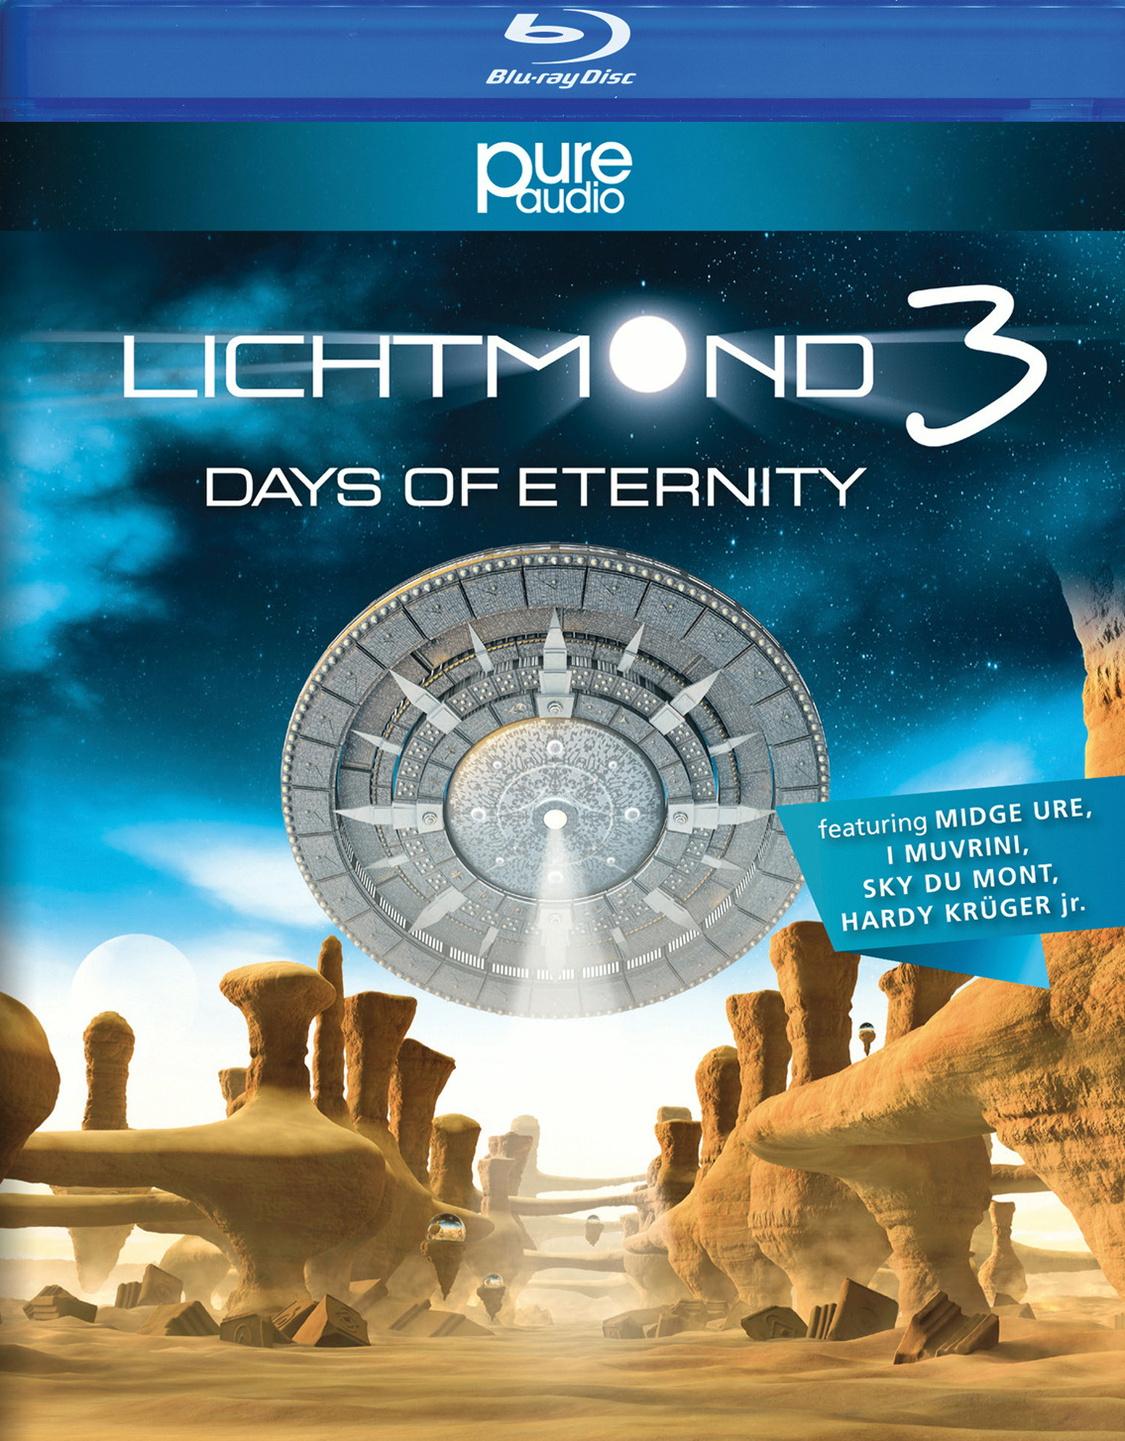 Lichtmond - Days Of Eternity (Pure Audio Blu-Ray)